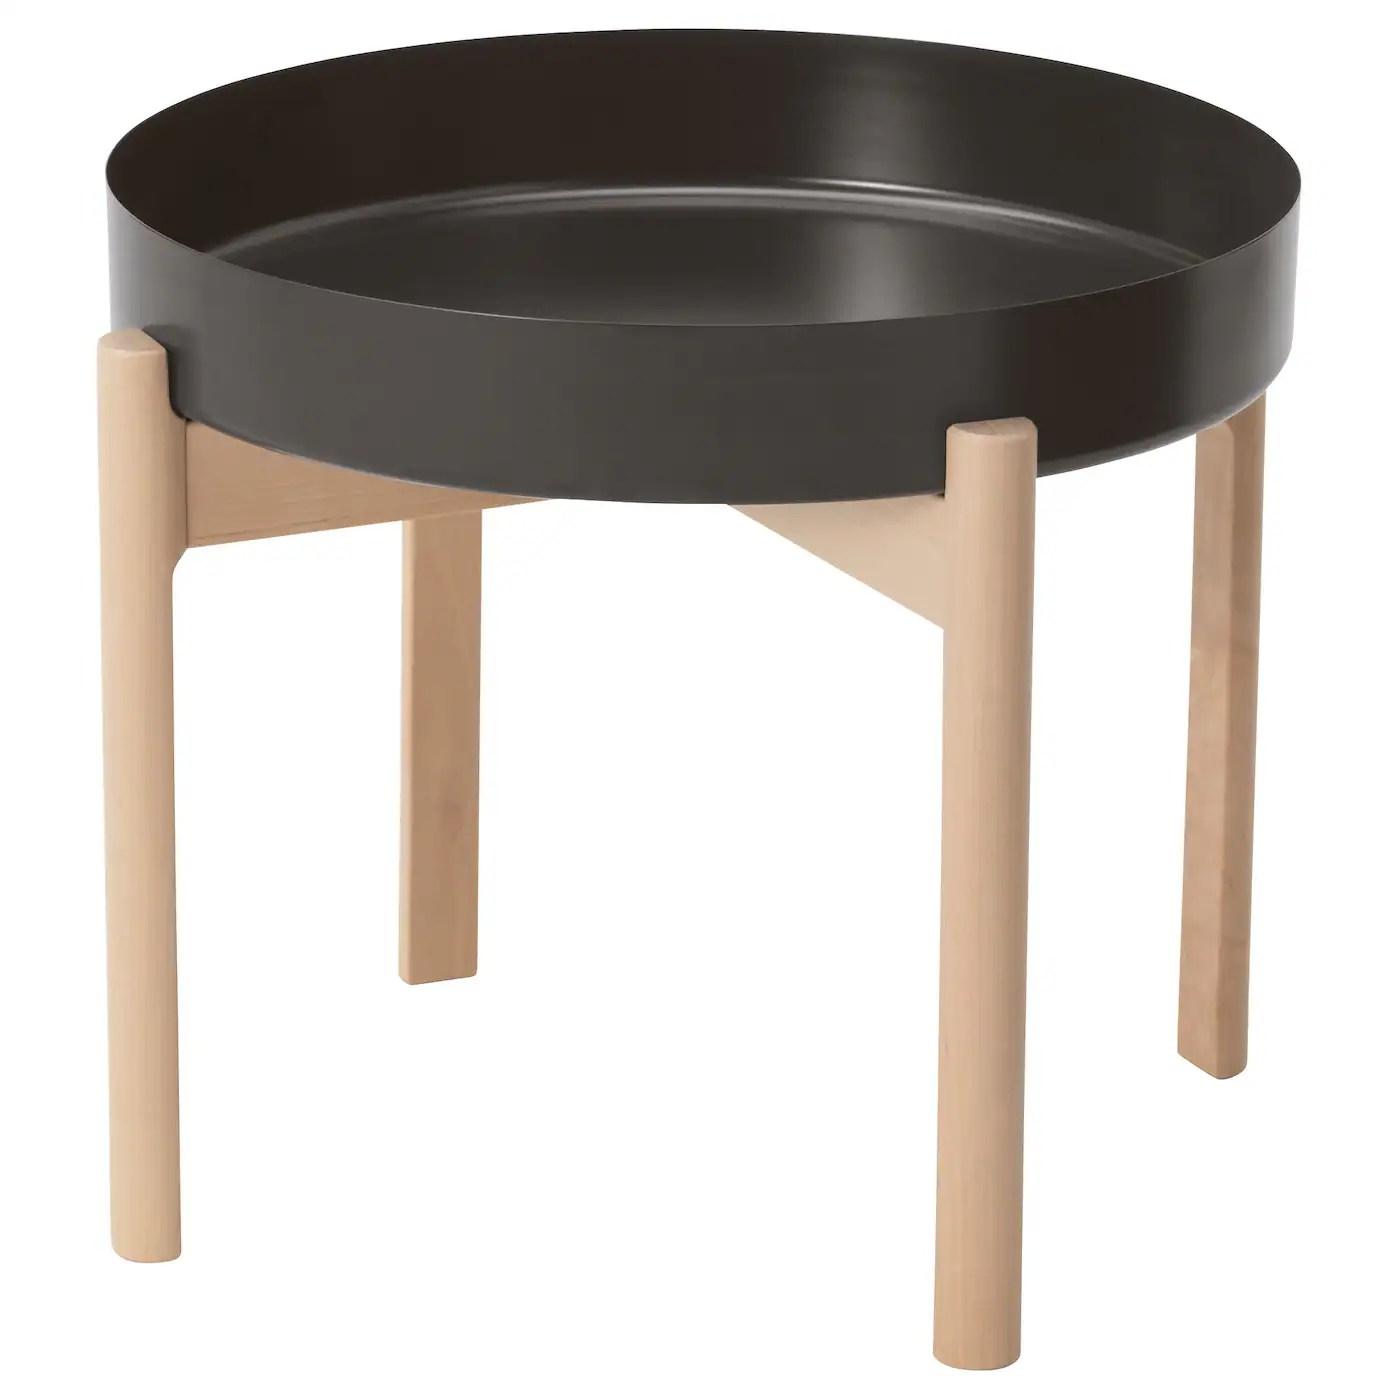 Ypperlig Table Basse Gris Fonce Bouleau Materiau Durable Ikea